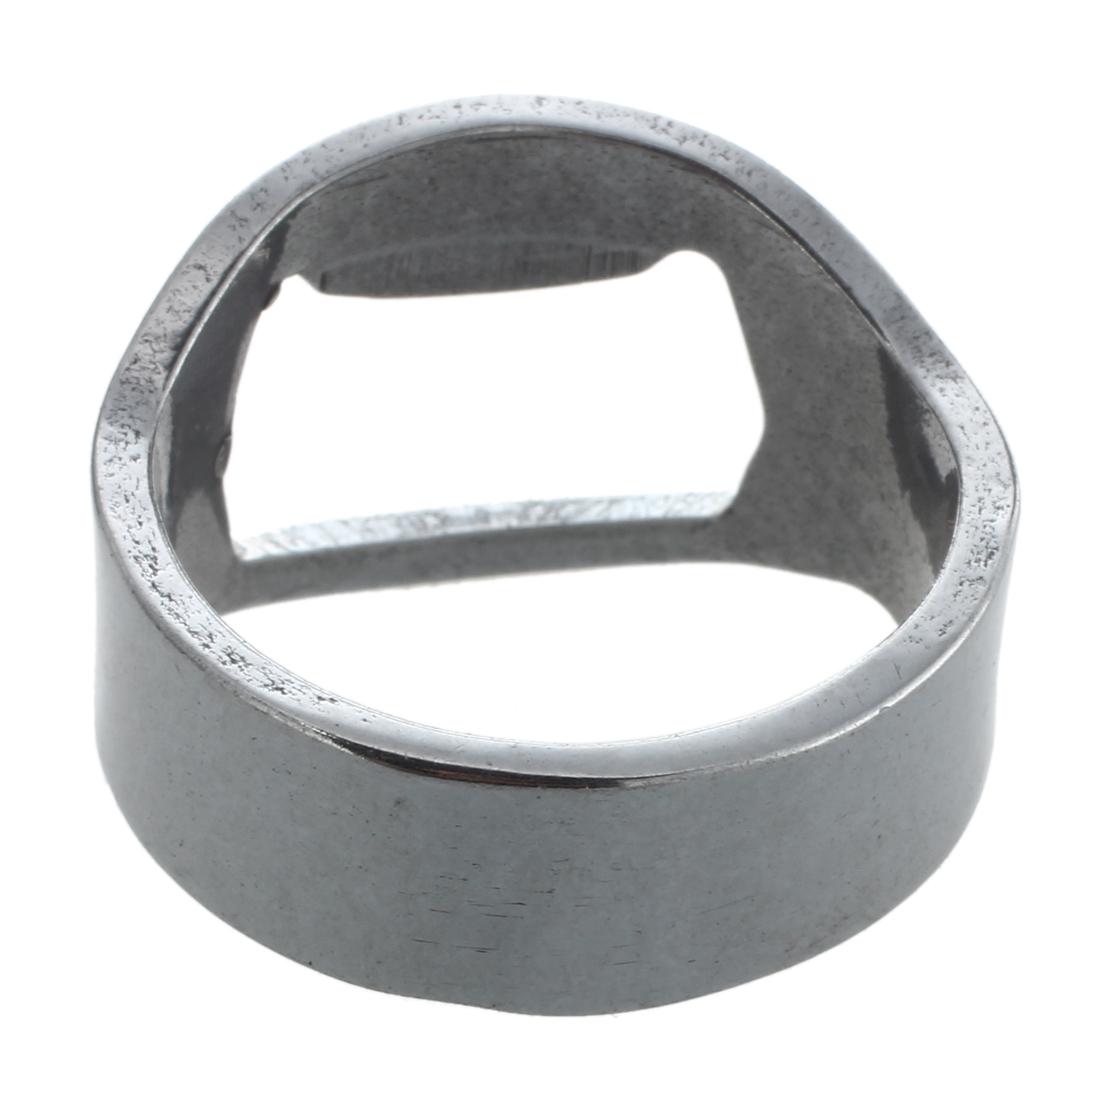 2x stainless steel finger ring bottle opener beer bottle opener m7g7 ebay. Black Bedroom Furniture Sets. Home Design Ideas